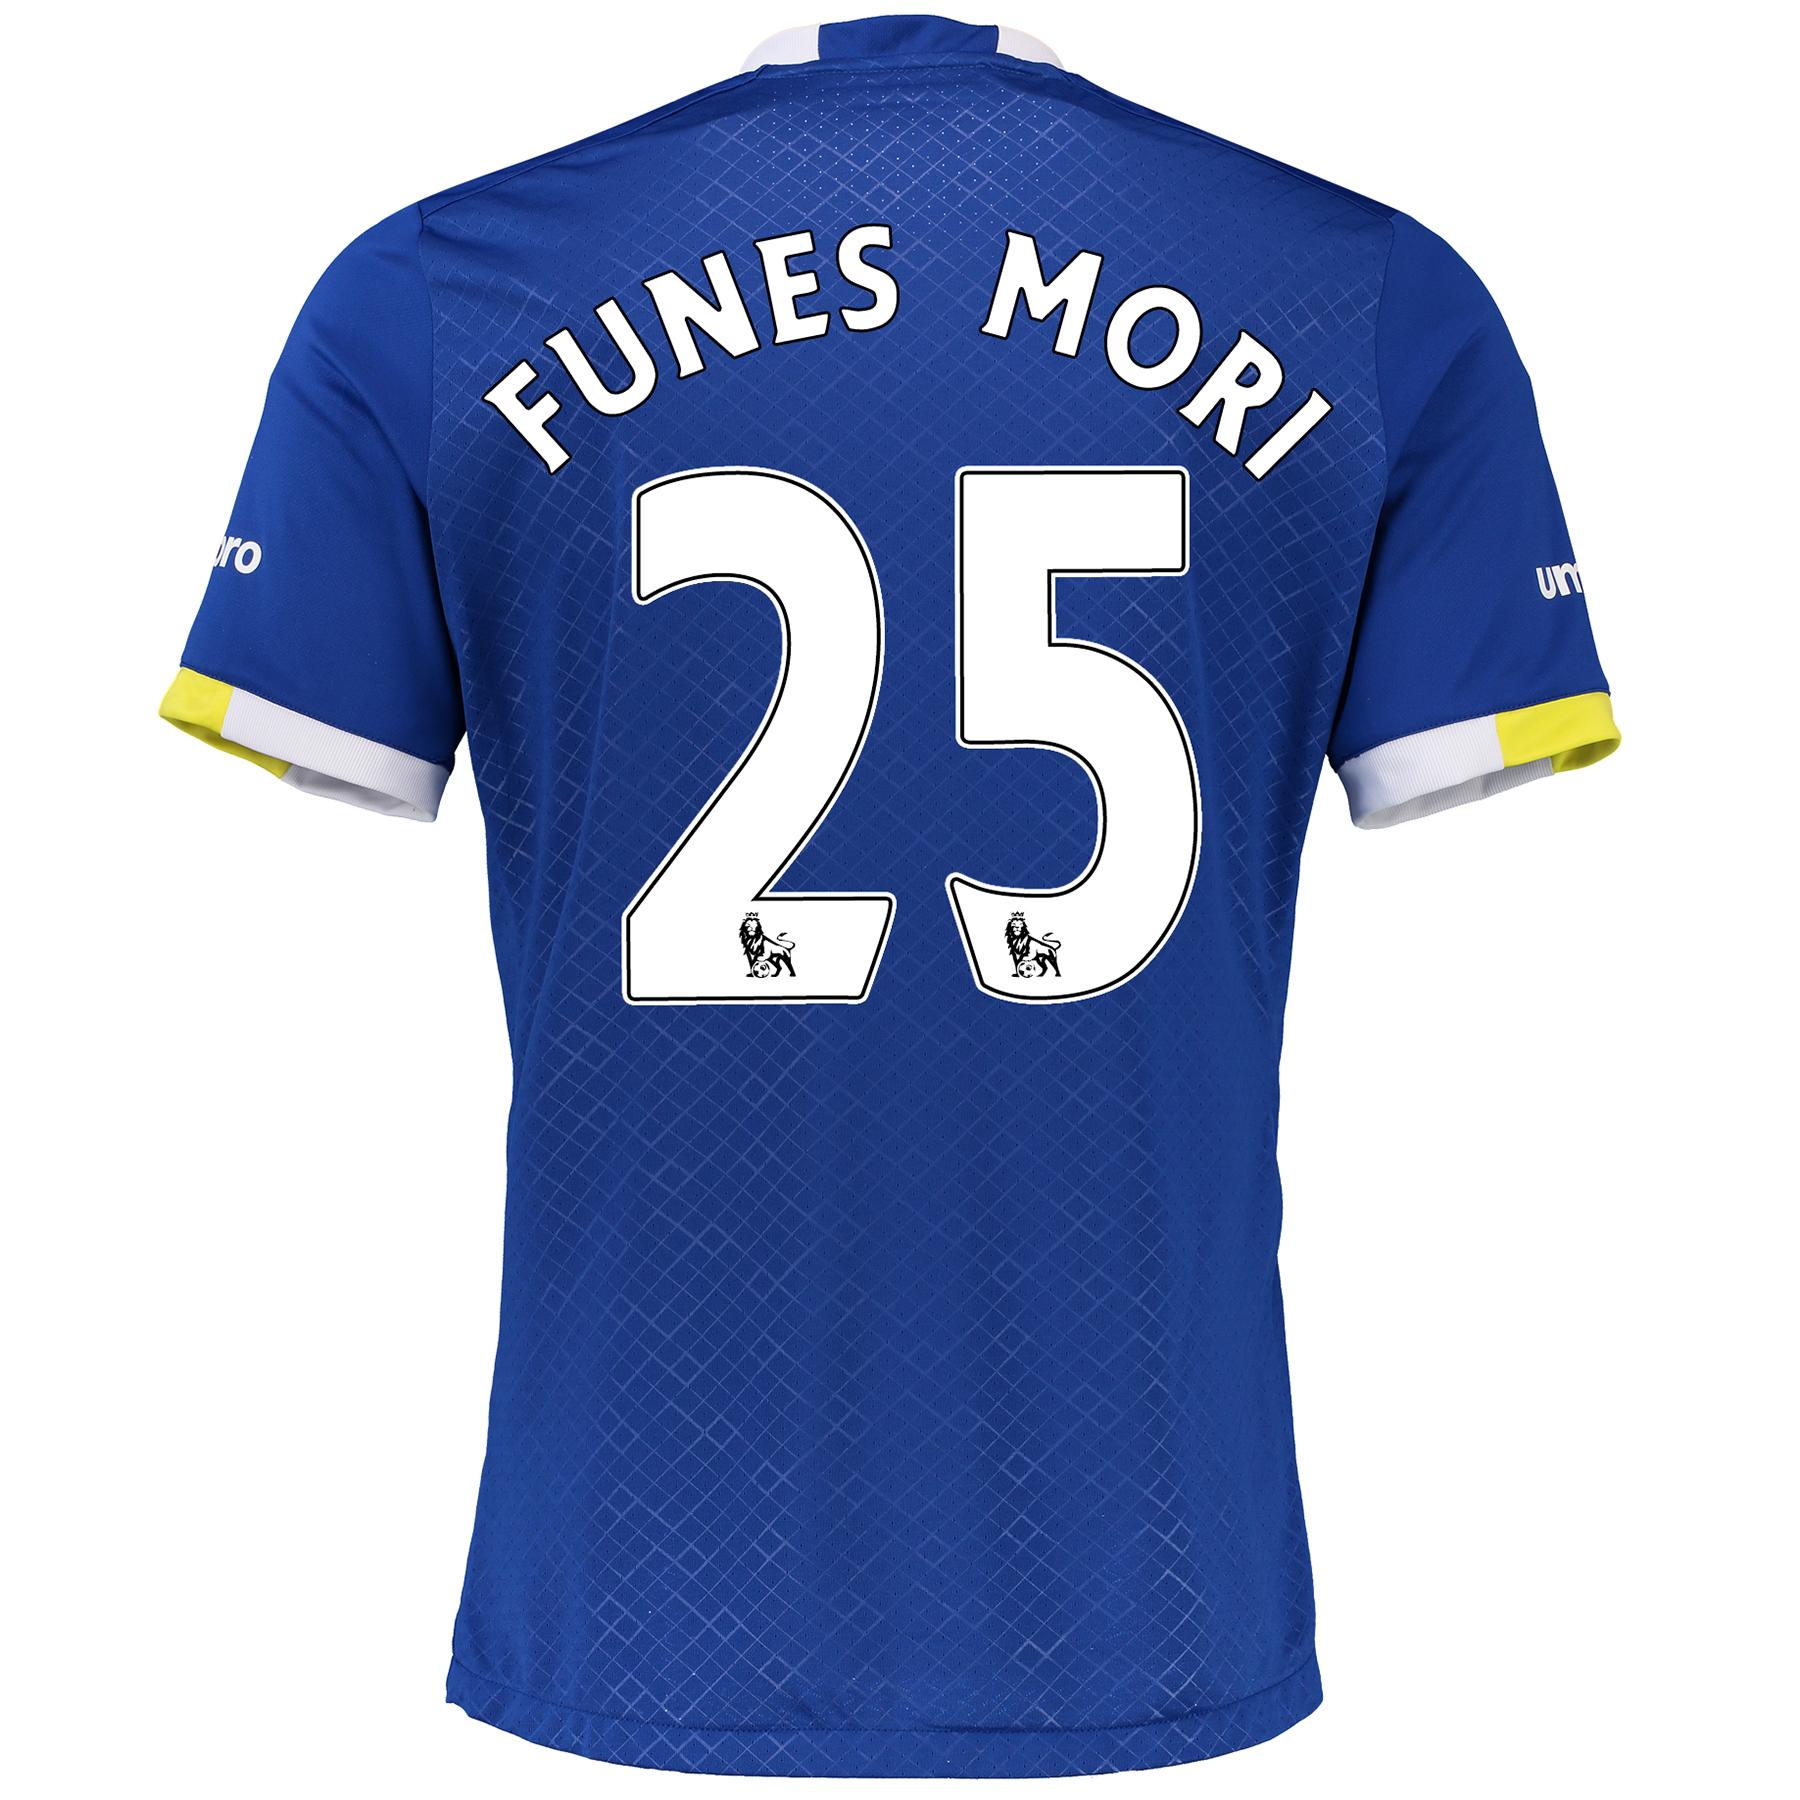 Everton Home Baby Kit 2016/17 with Funes Mori 25 printing